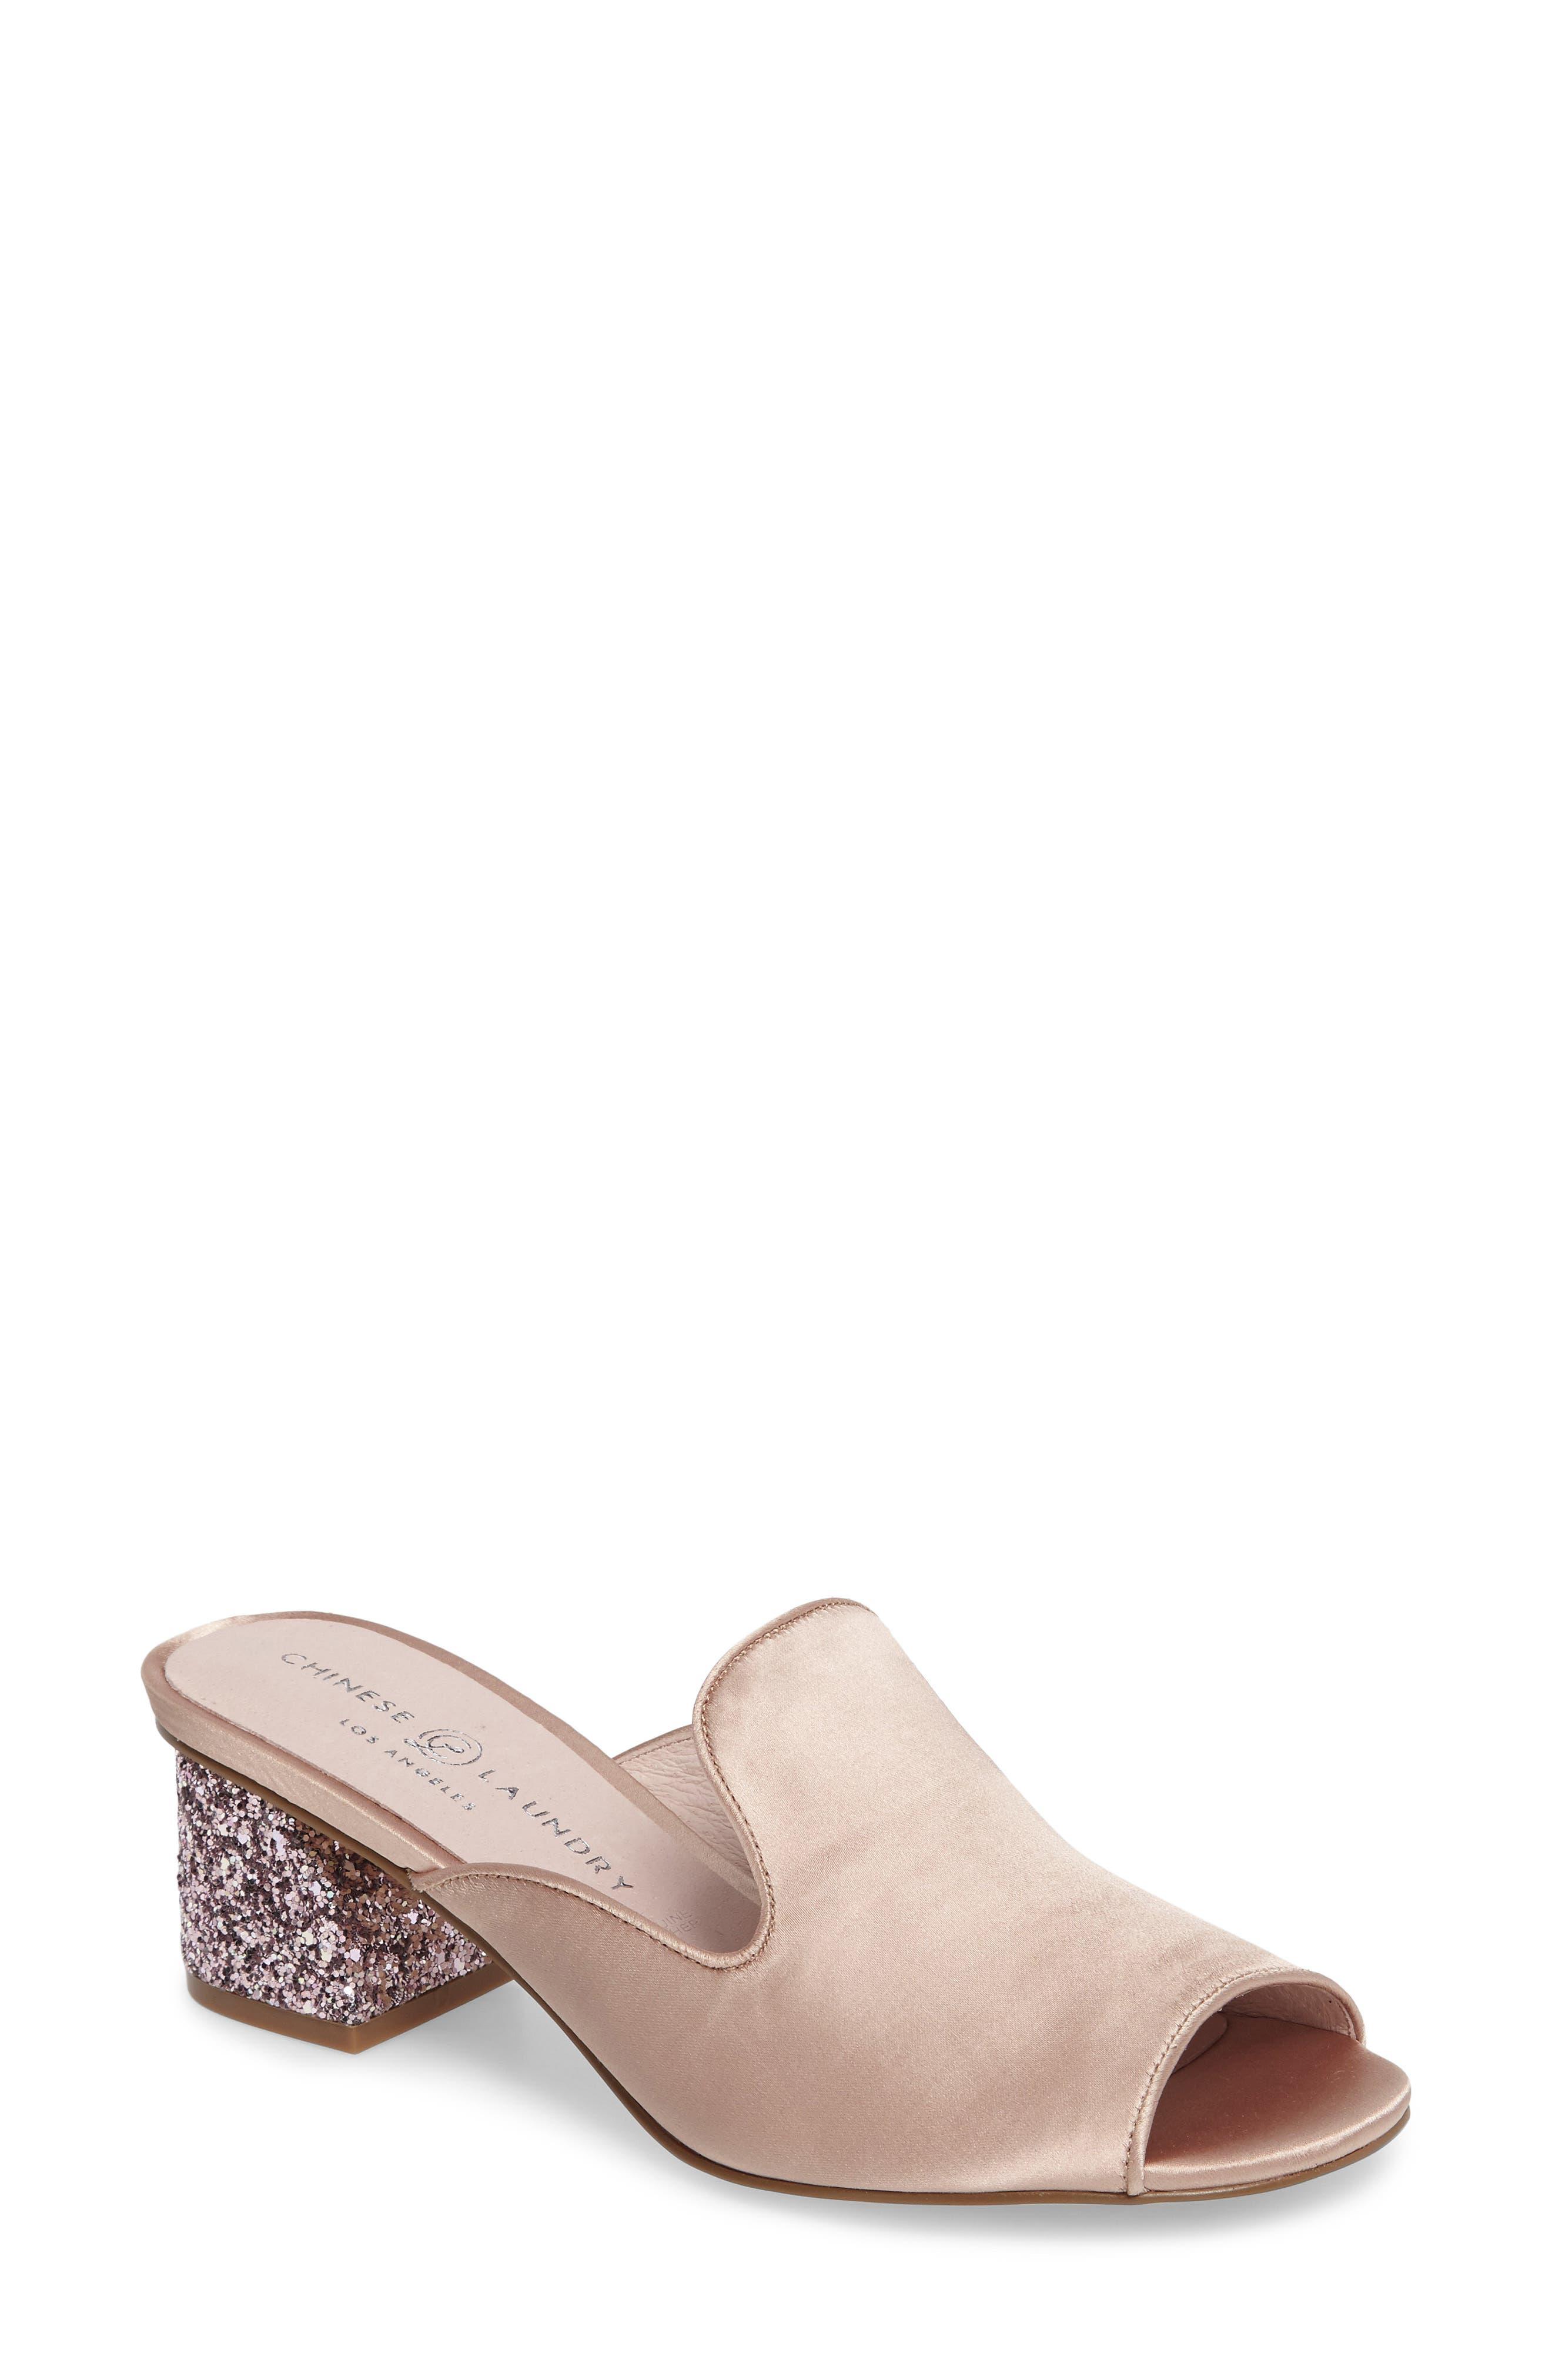 Mara Glitter Loafer Mule,                             Main thumbnail 1, color,                             Summer Nude Satin